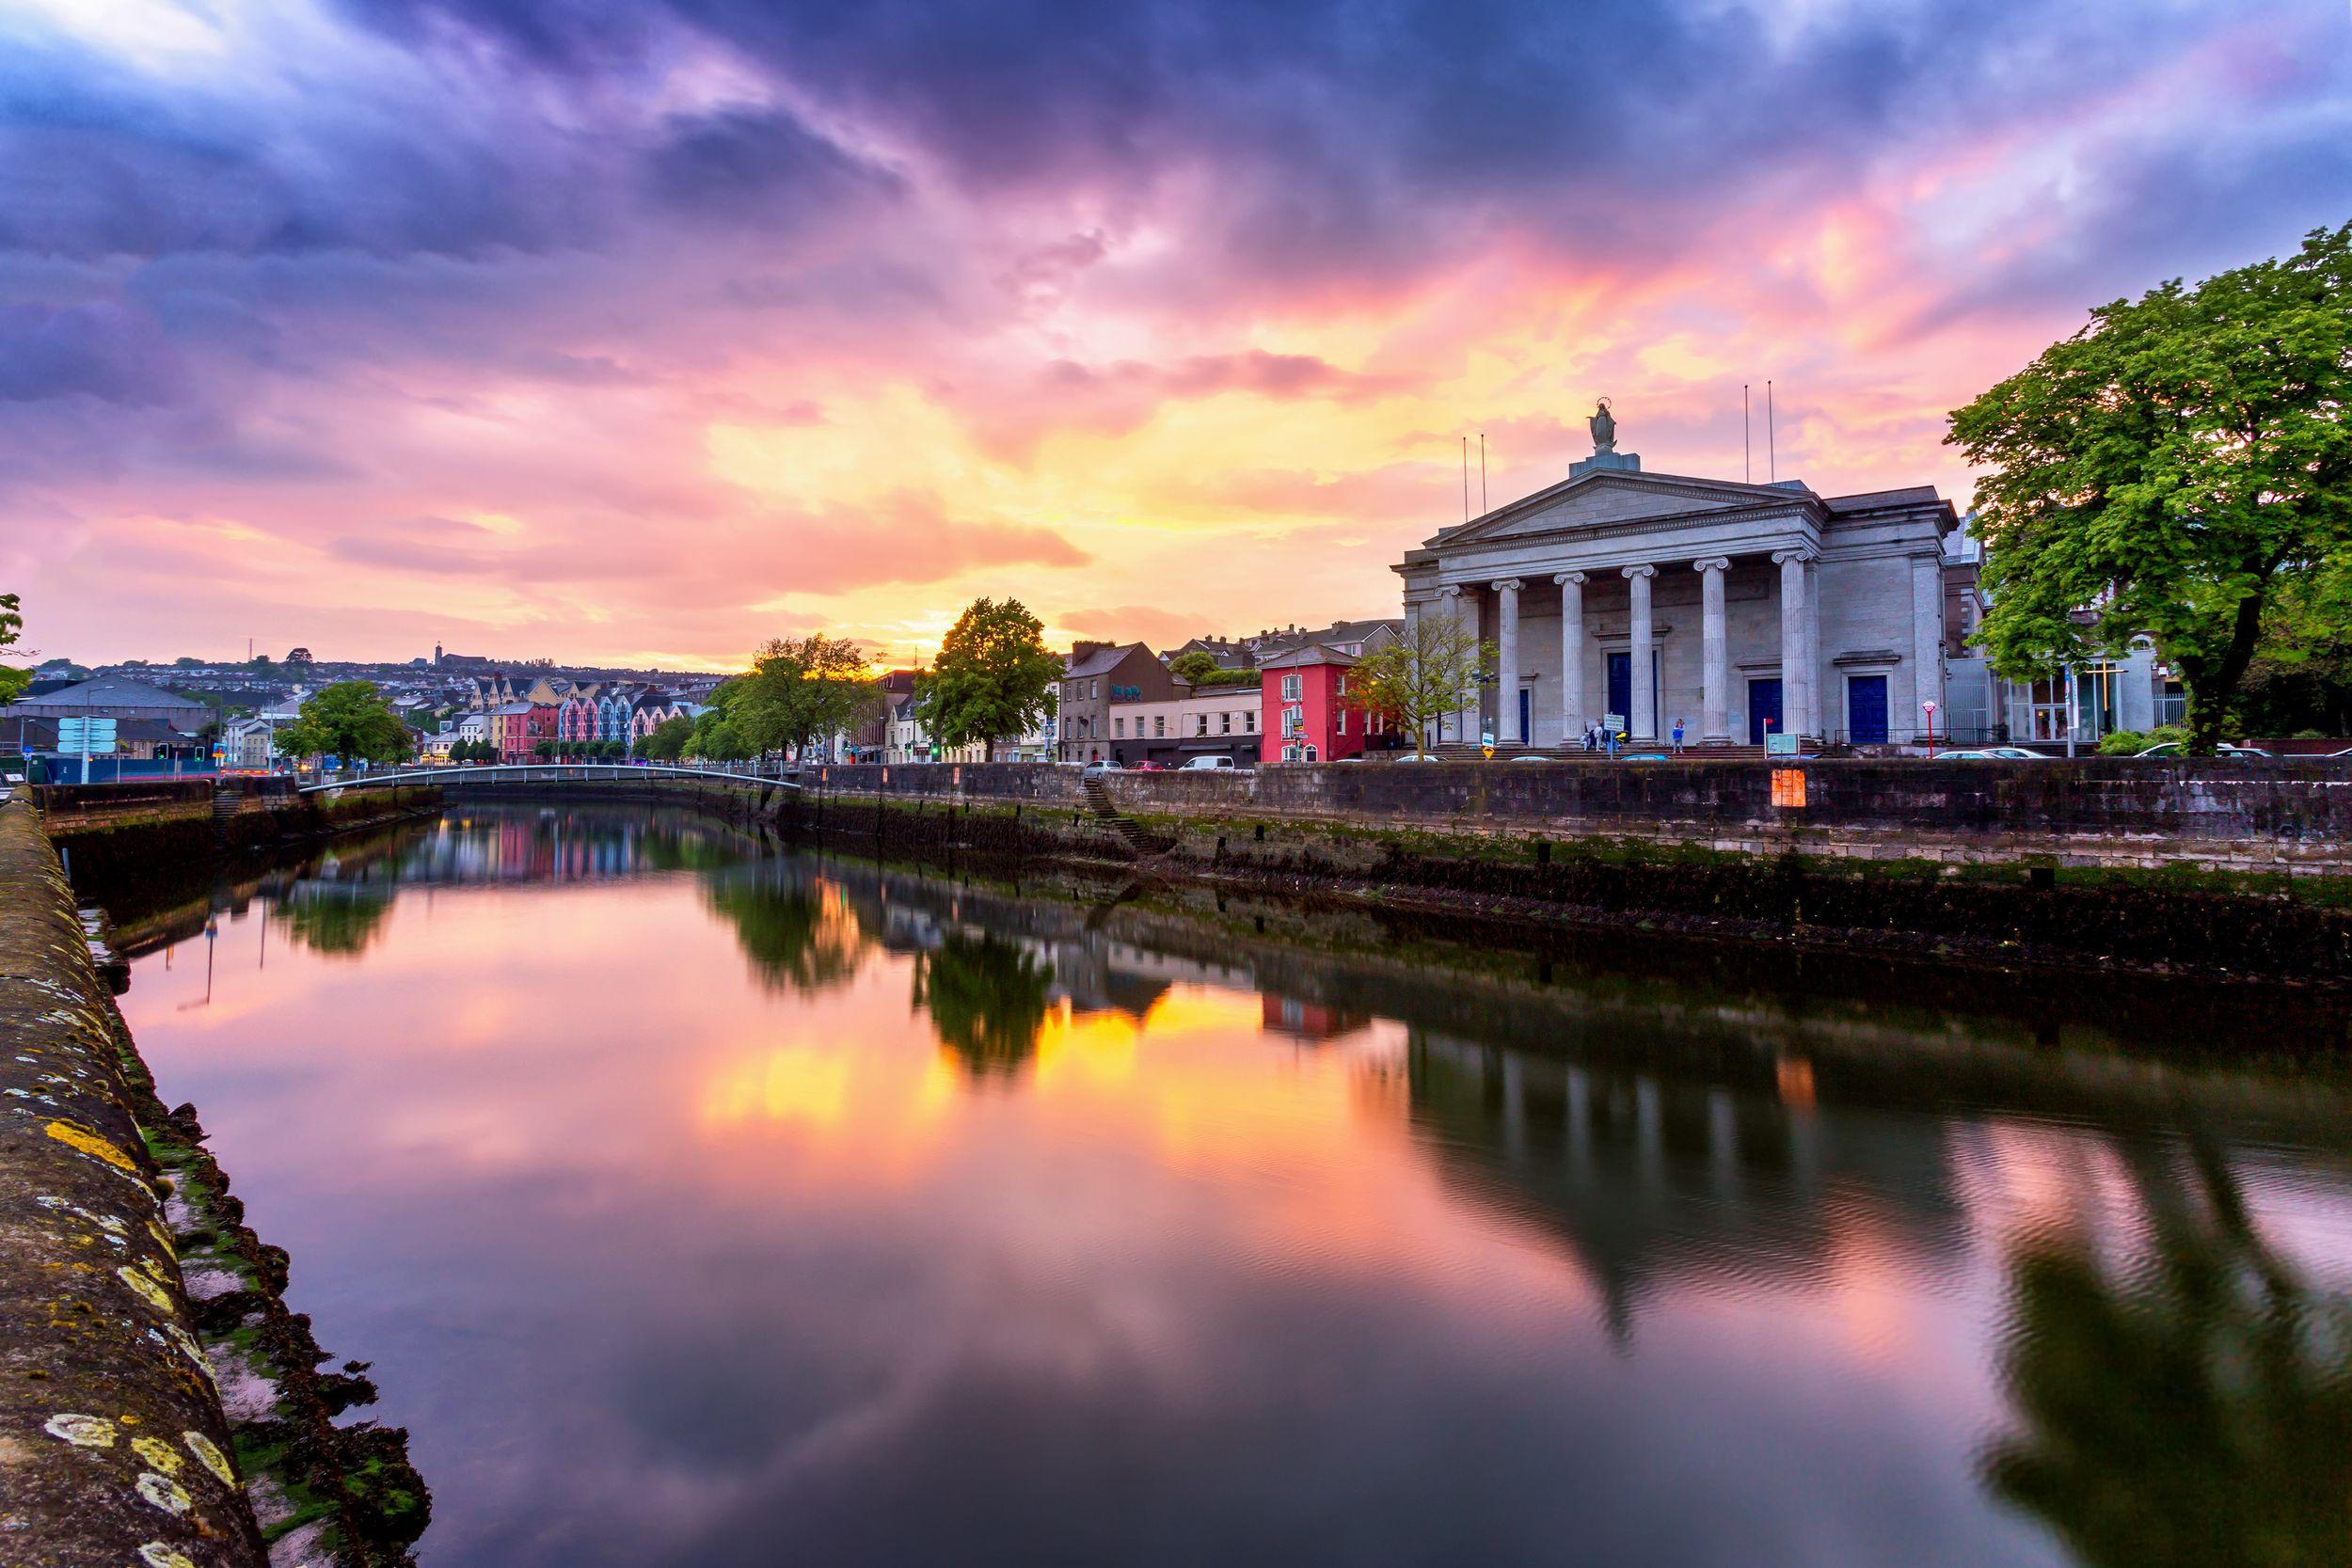 Cork_City_Hallresized